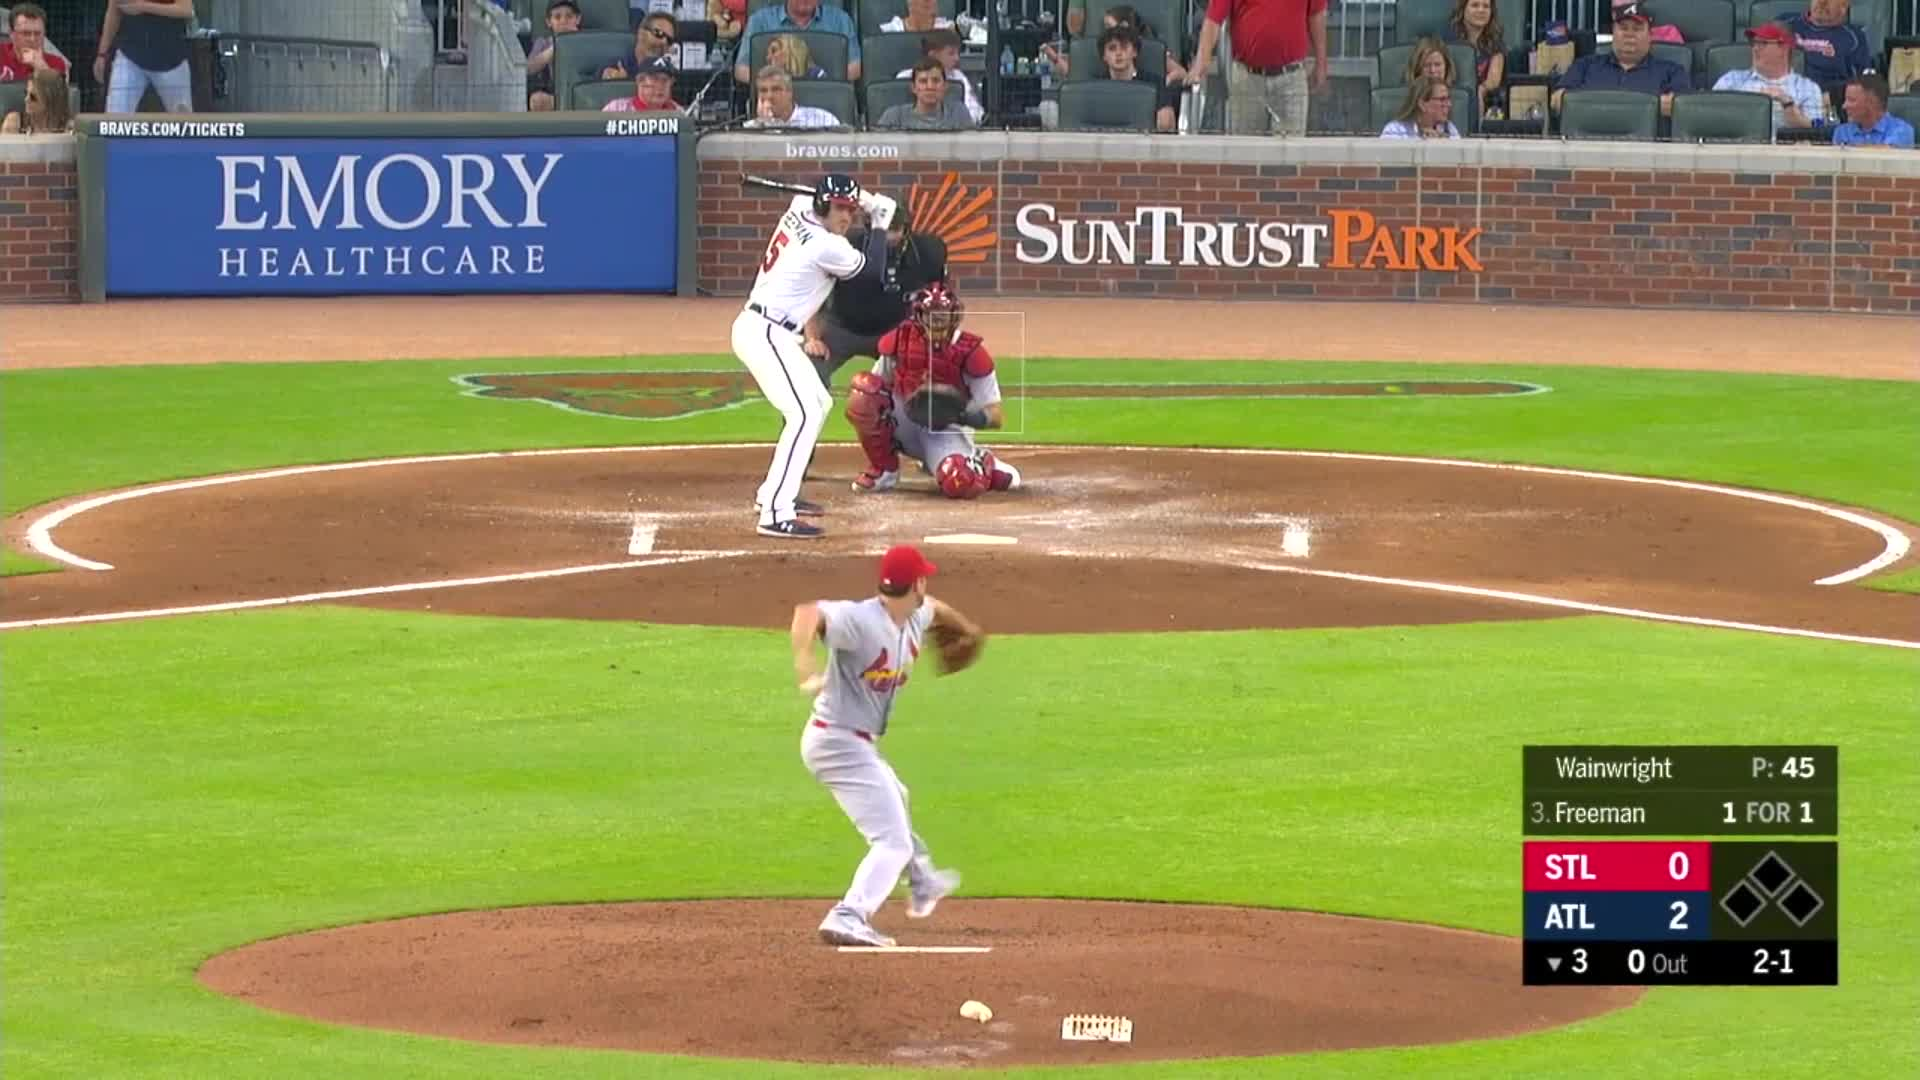 Freddie Freeman Dances To Avoid Baseball Gif By Handlit33 Gfycat